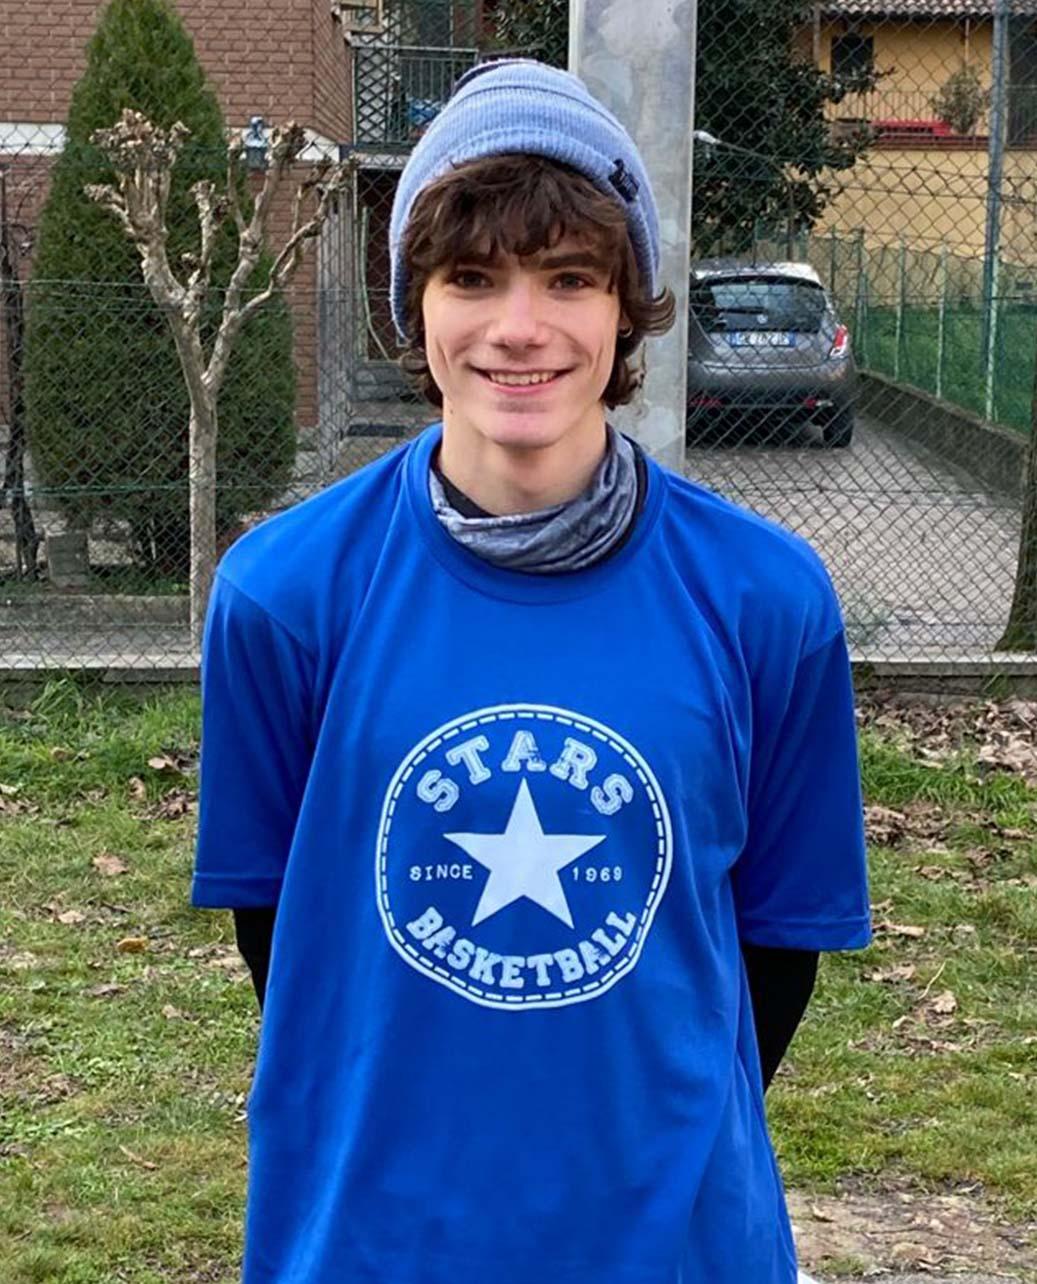 Brunetti Filippo - Under 18